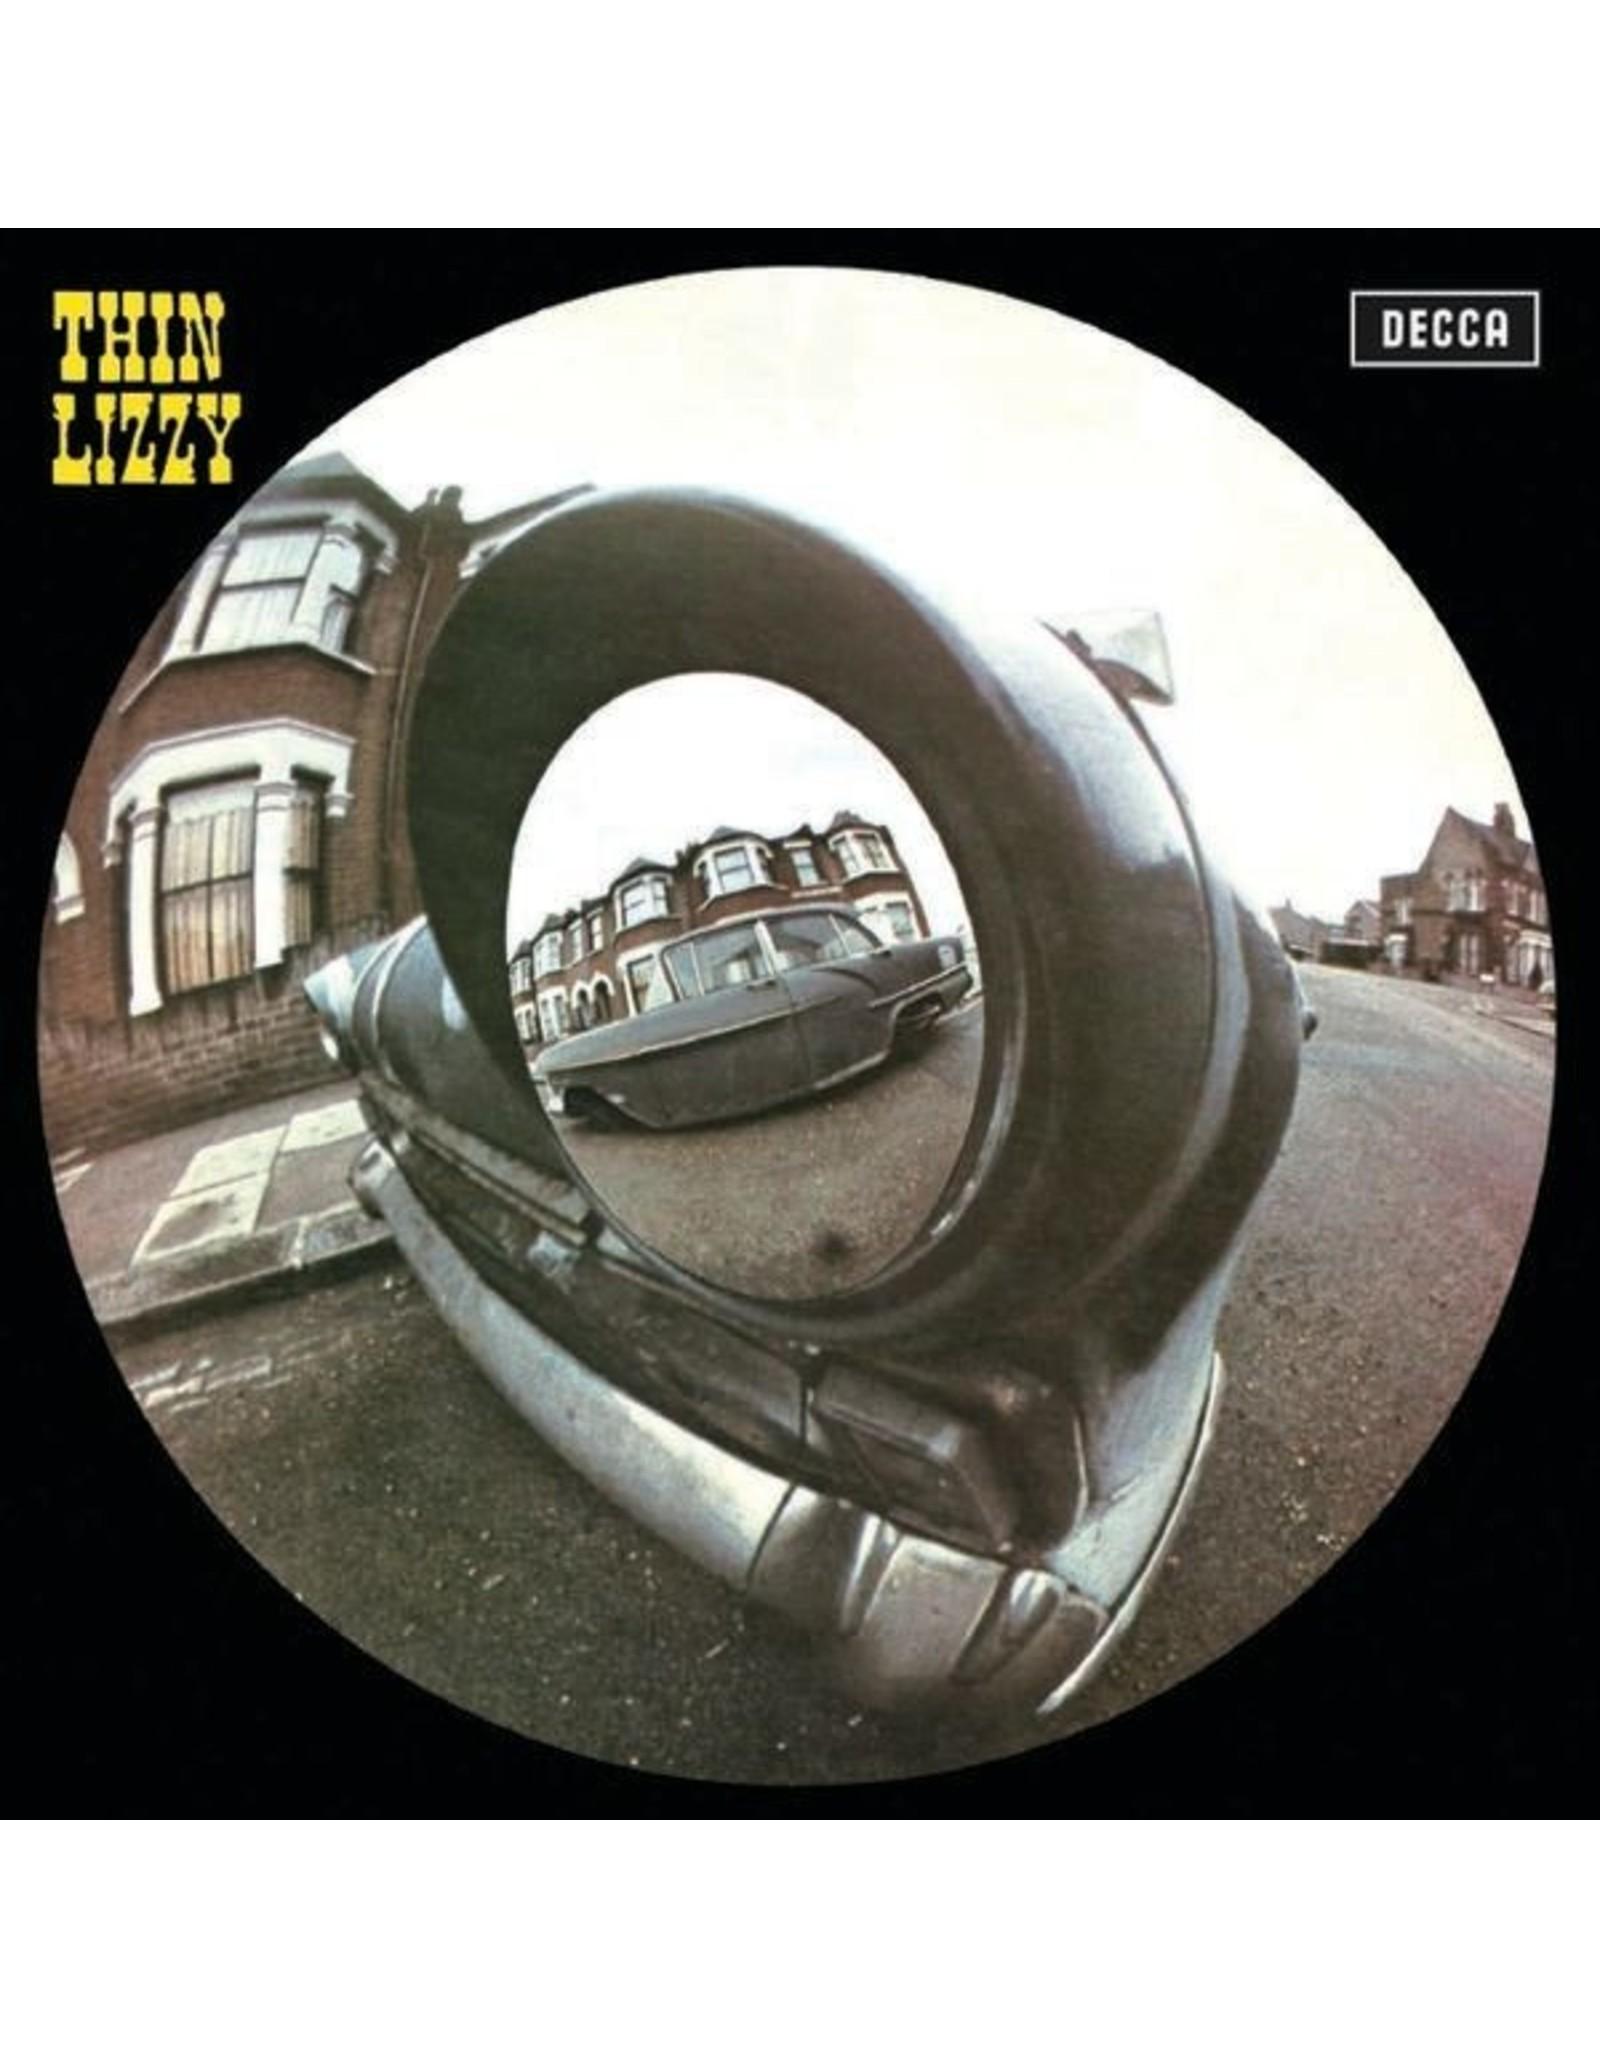 Vinyl Thin Lizzy - S/T